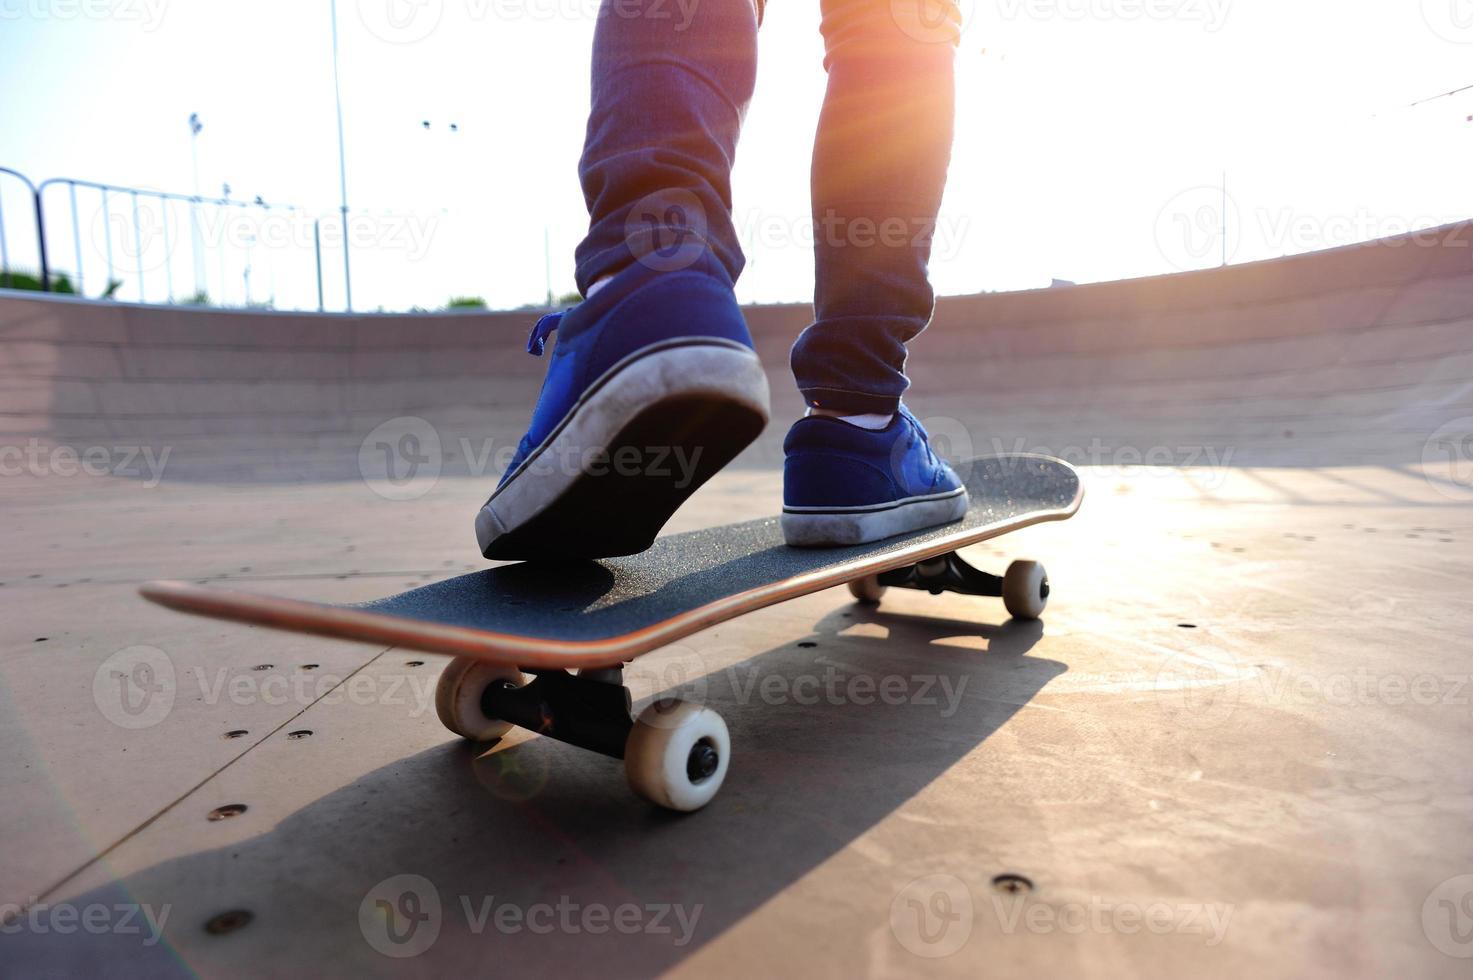 ochtendsessie van een skateboarder in het skatepark foto